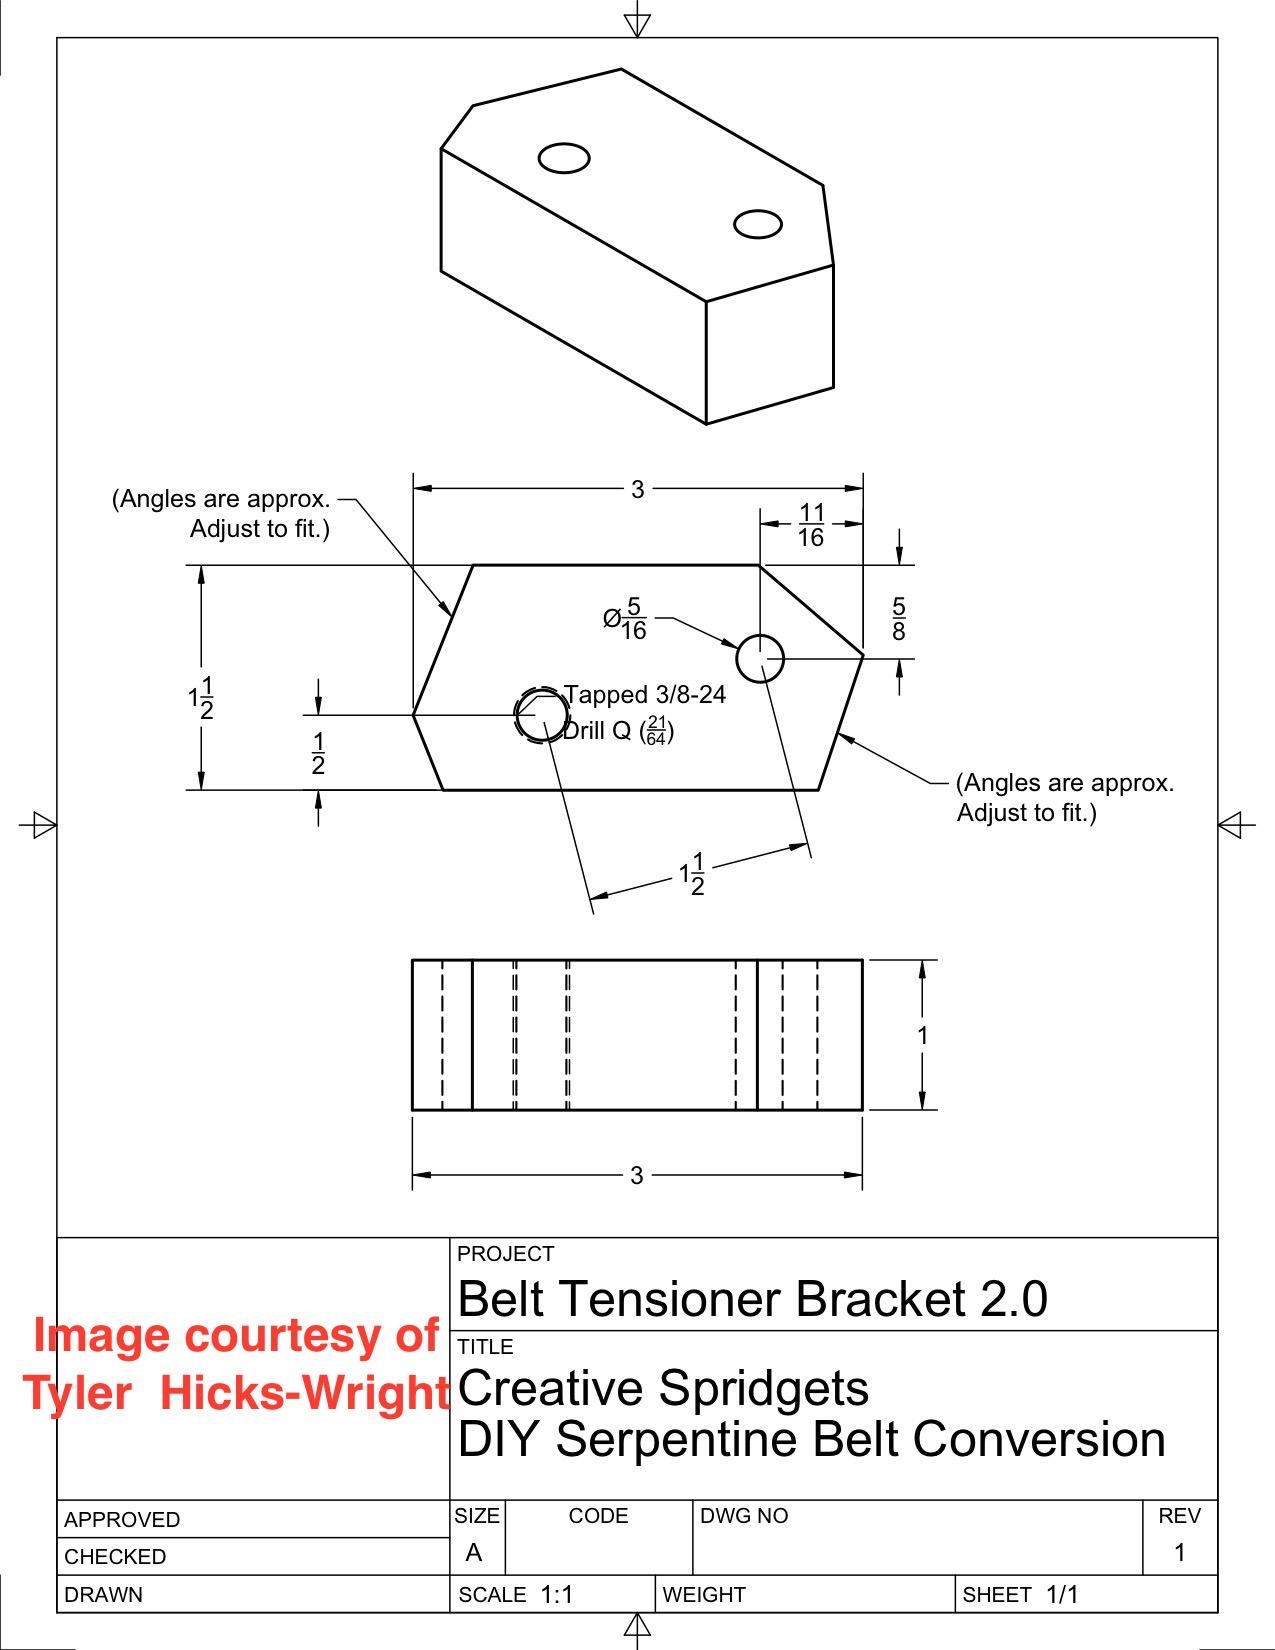 Belt Tensioner Bracket 2.0 copy (1).jpg